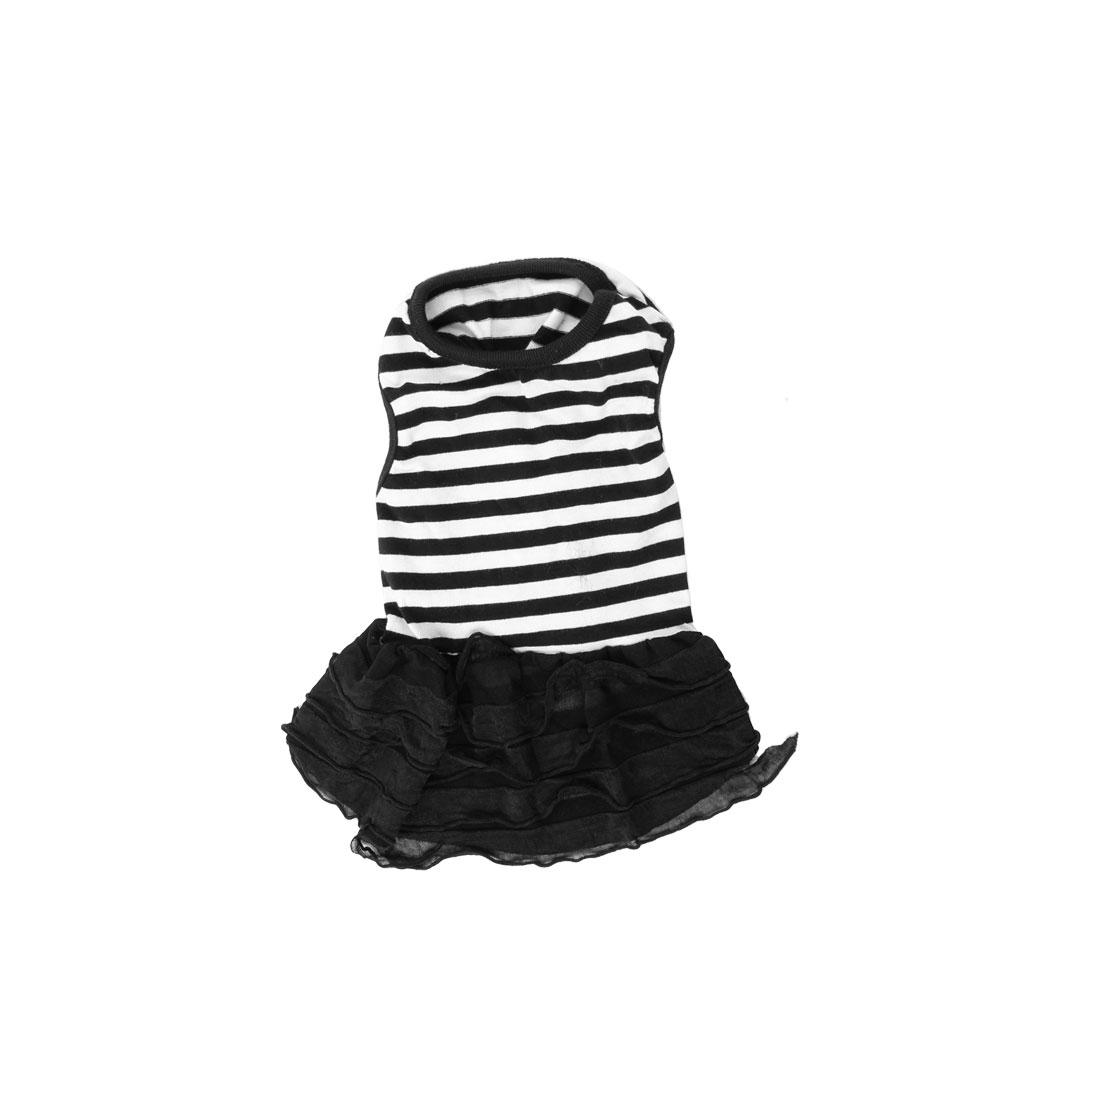 Tiered Sleeveless Stripe Printed Pet Dog Yorkie Dress Clothes Black White XS